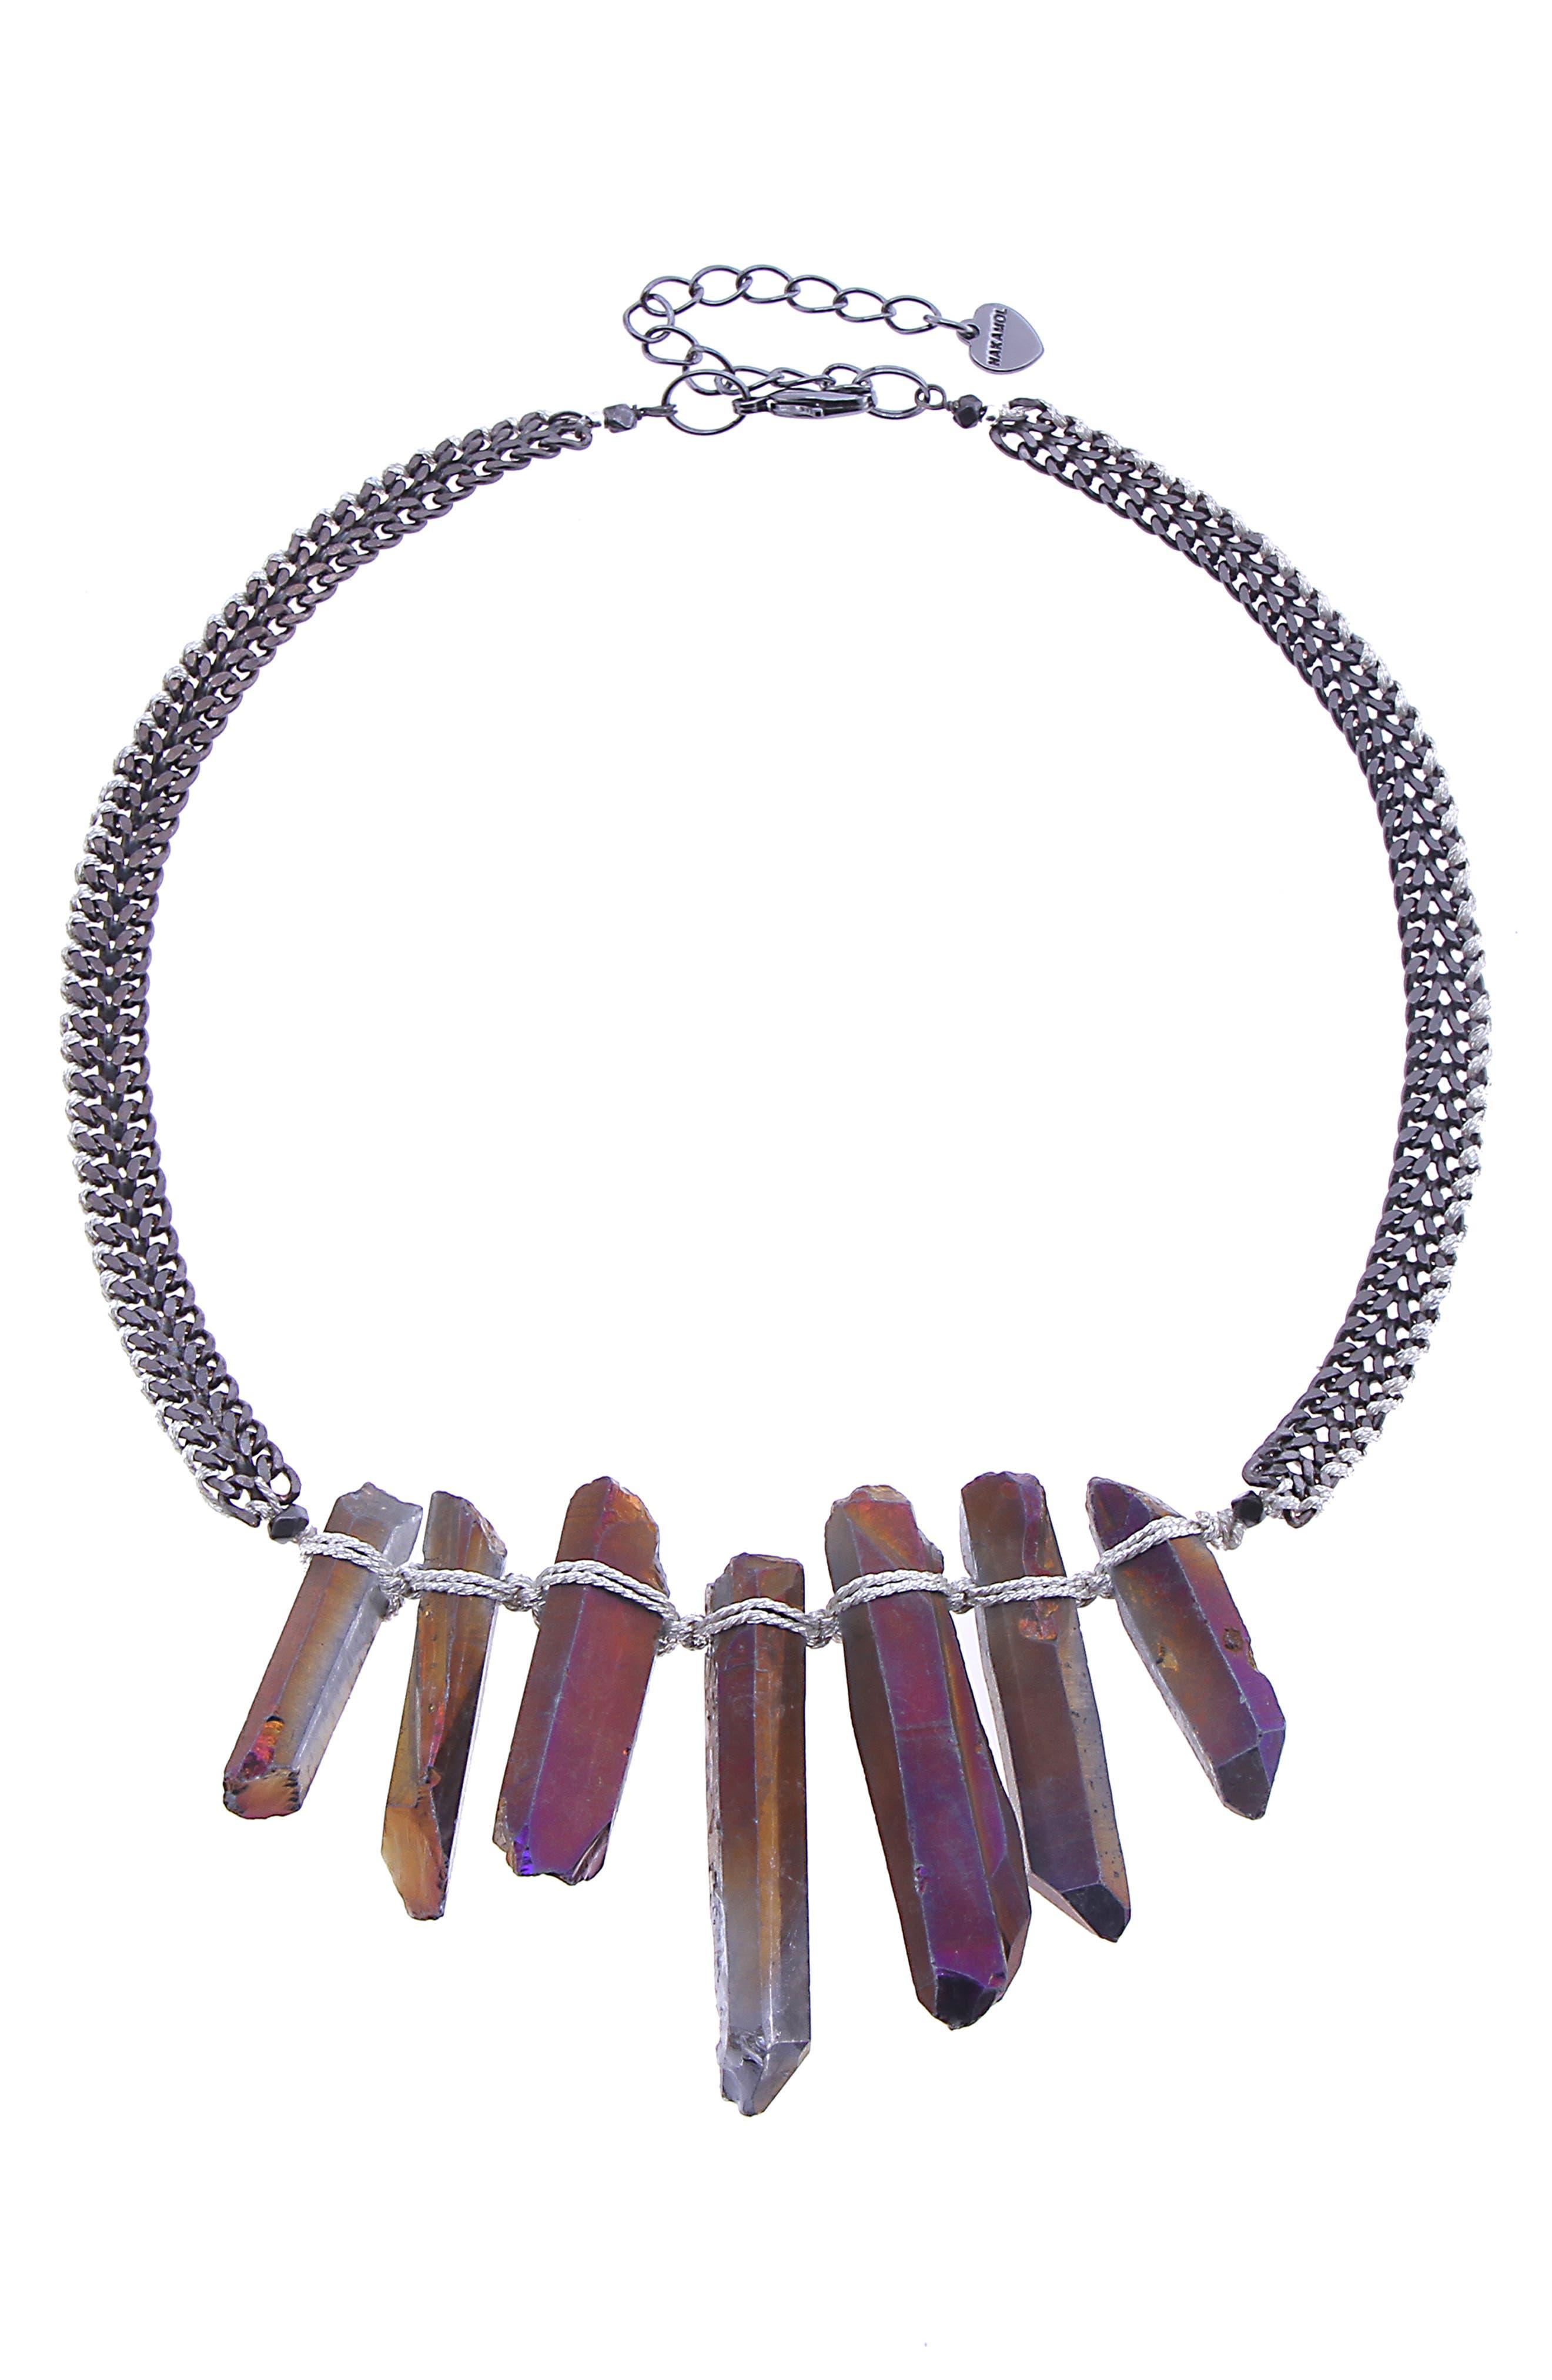 Amazonite Stick Statement Necklace,                         Main,                         color, PURPLE